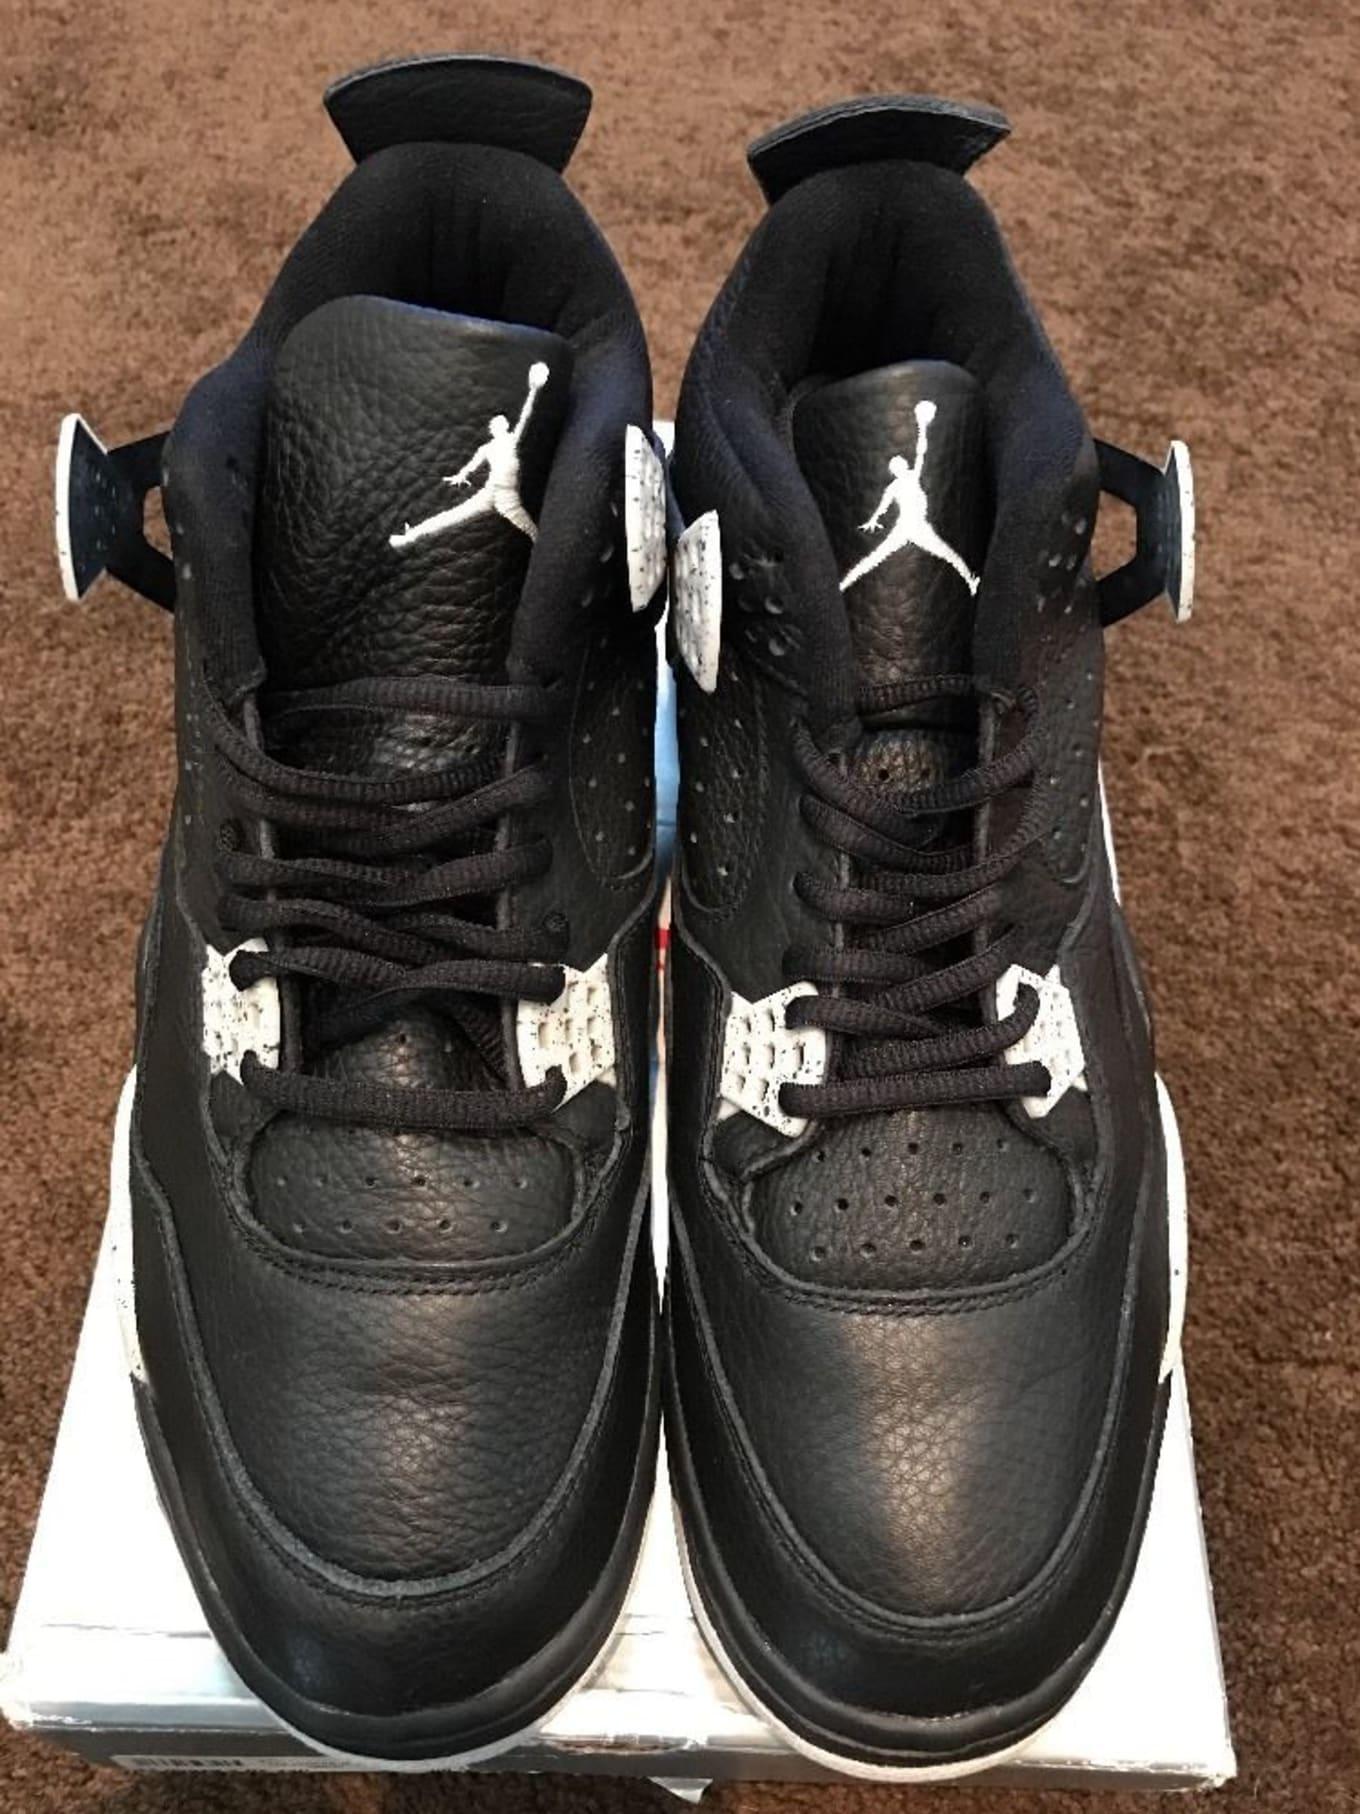 c62fbaffb44f7 Air Jordan 4